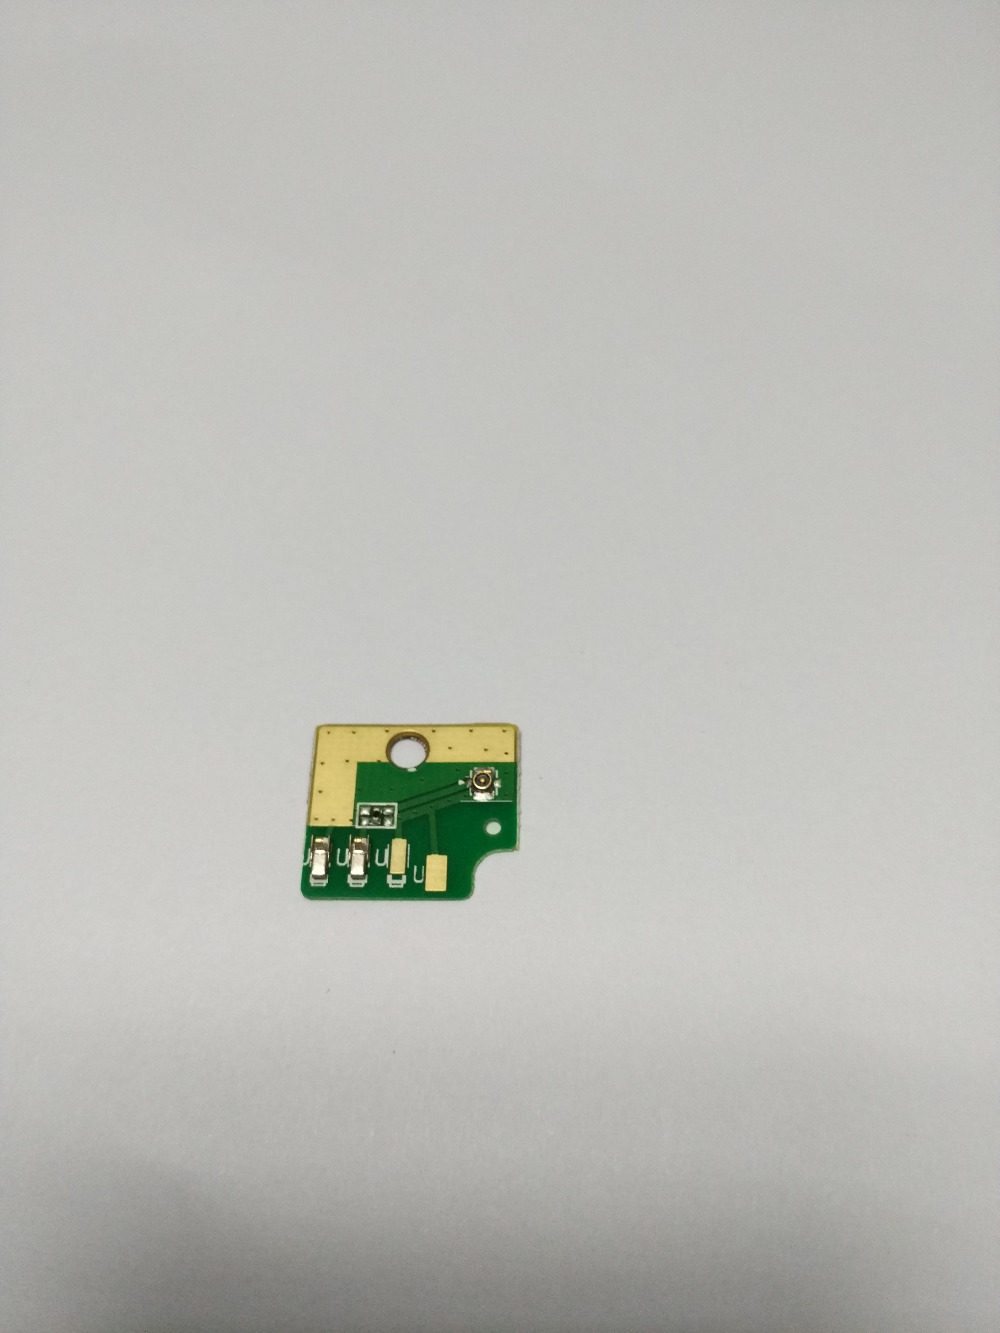 Used working Umi fair GSM / WCDMA Signal antenna Small Board repair parts for Umi fair F ...